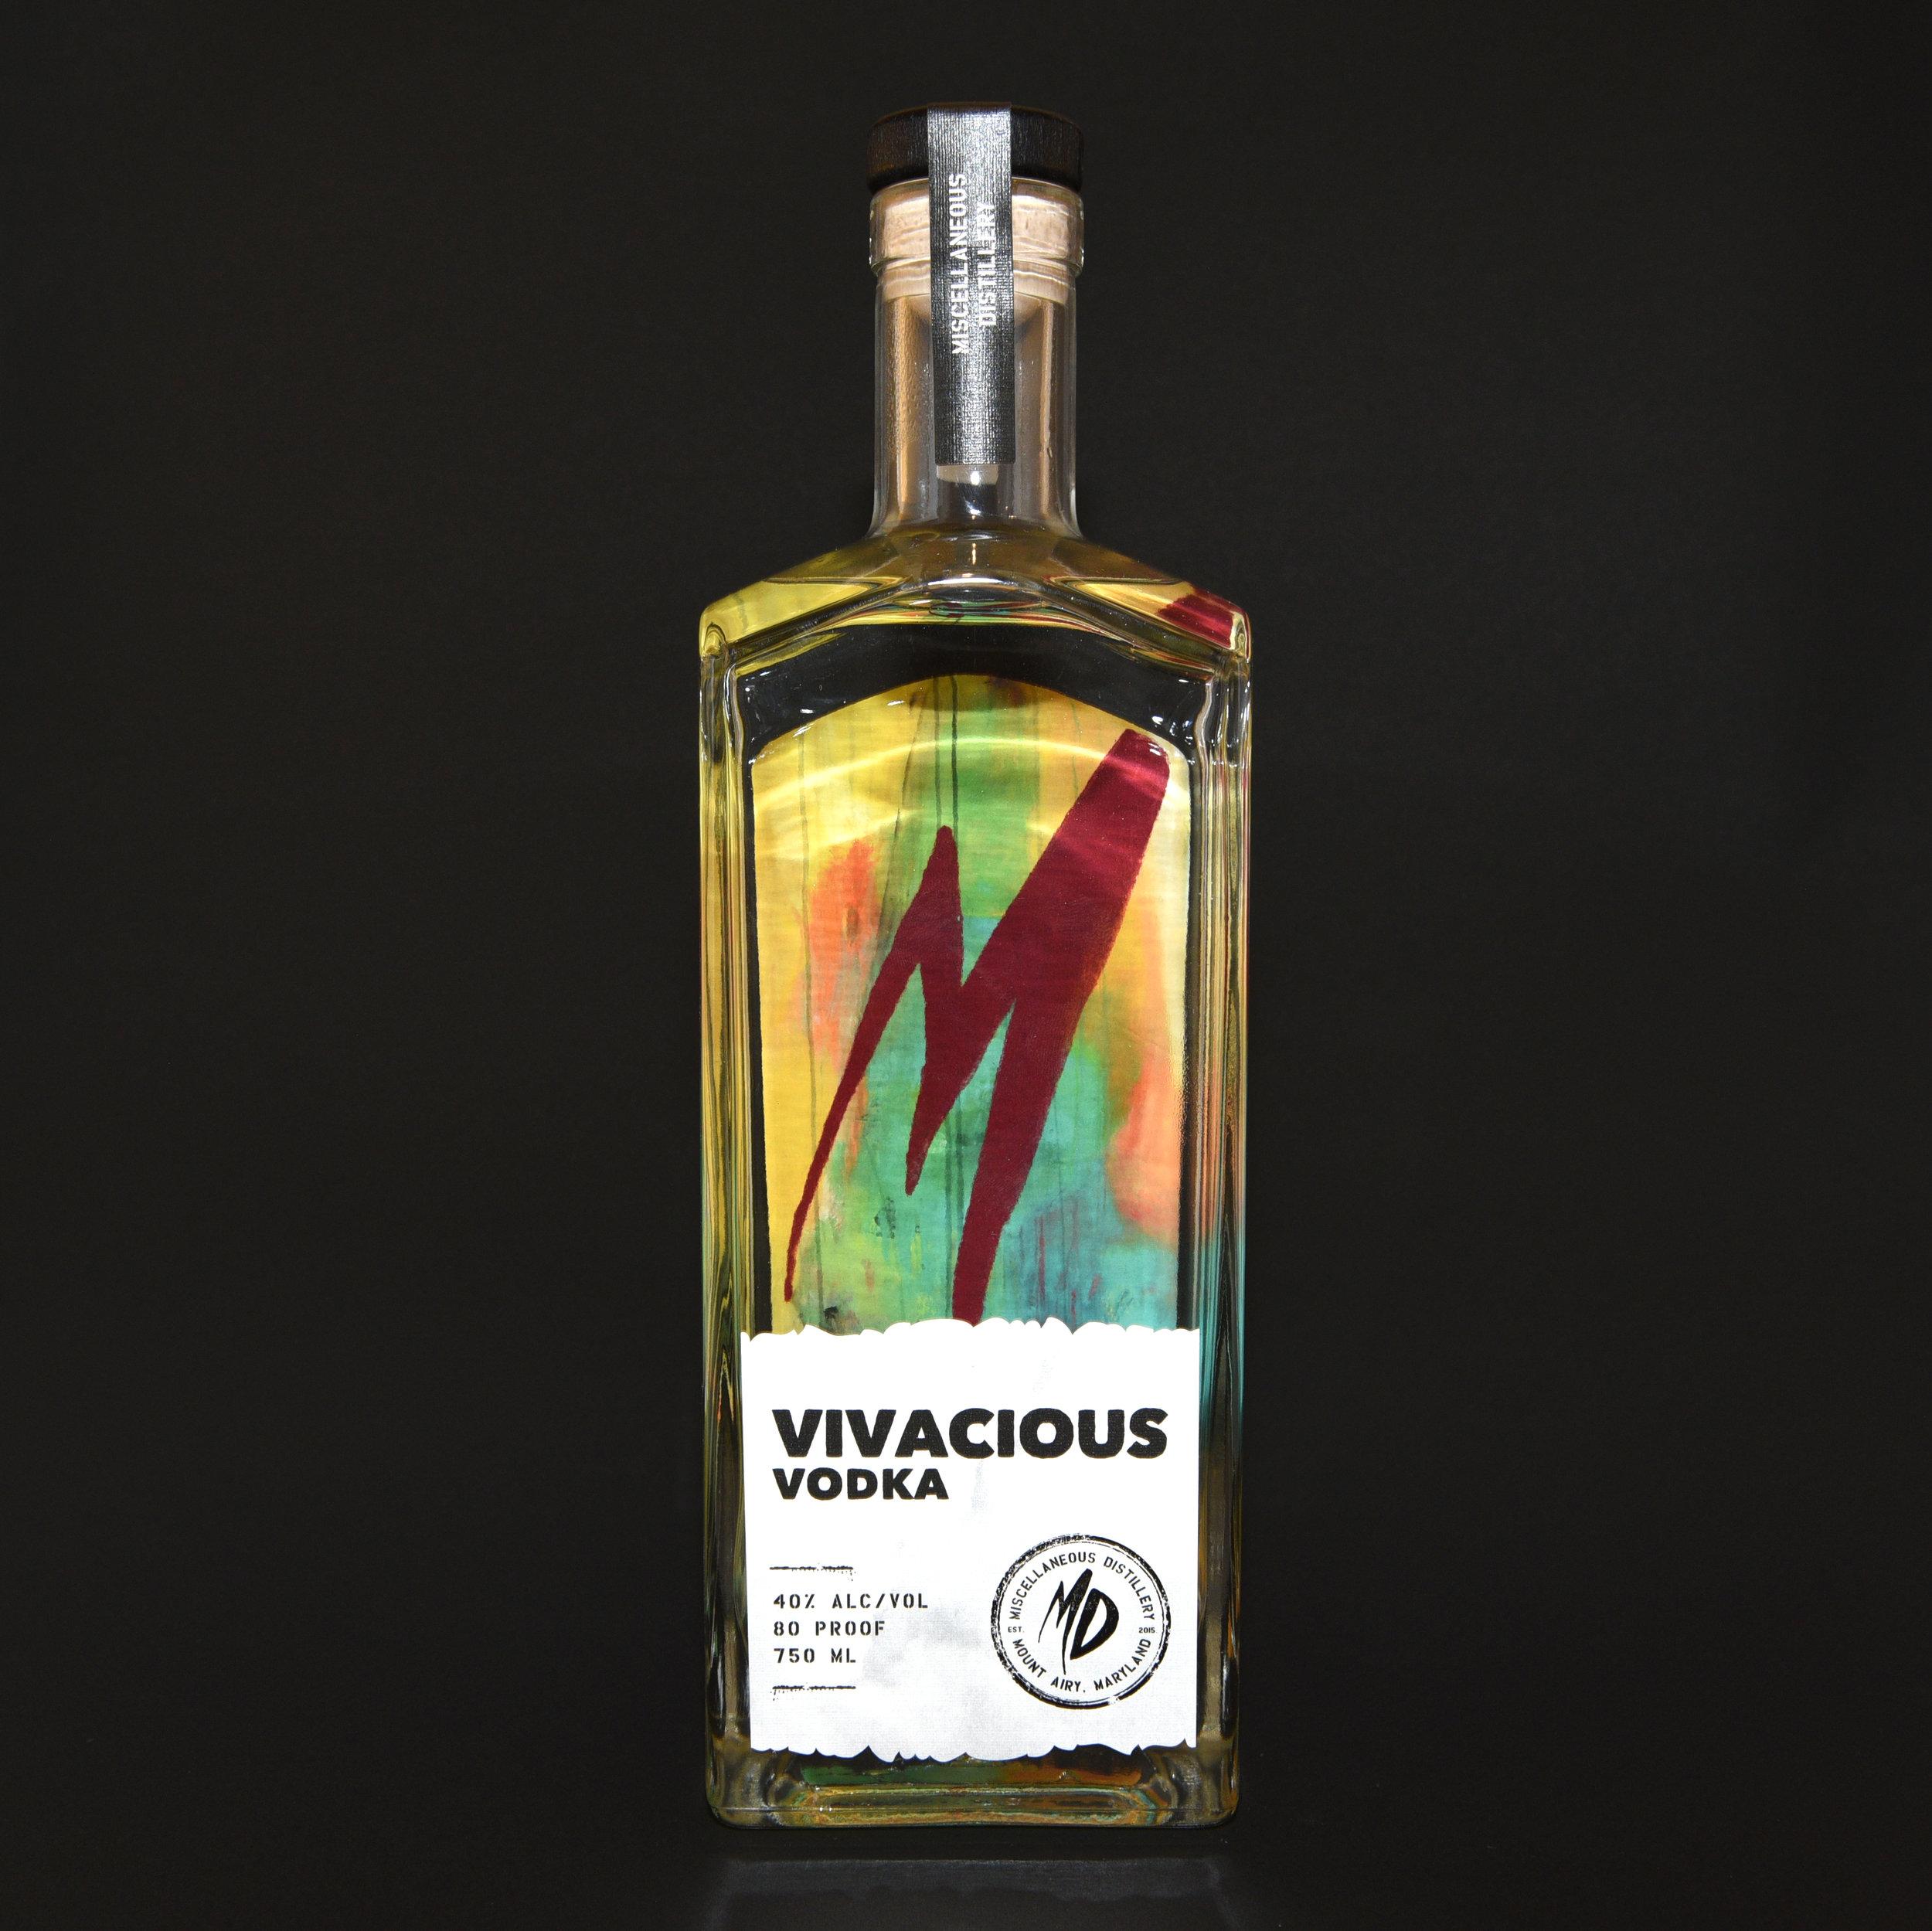 MISC_Vivacious Vodka_black_bgkd.jpg